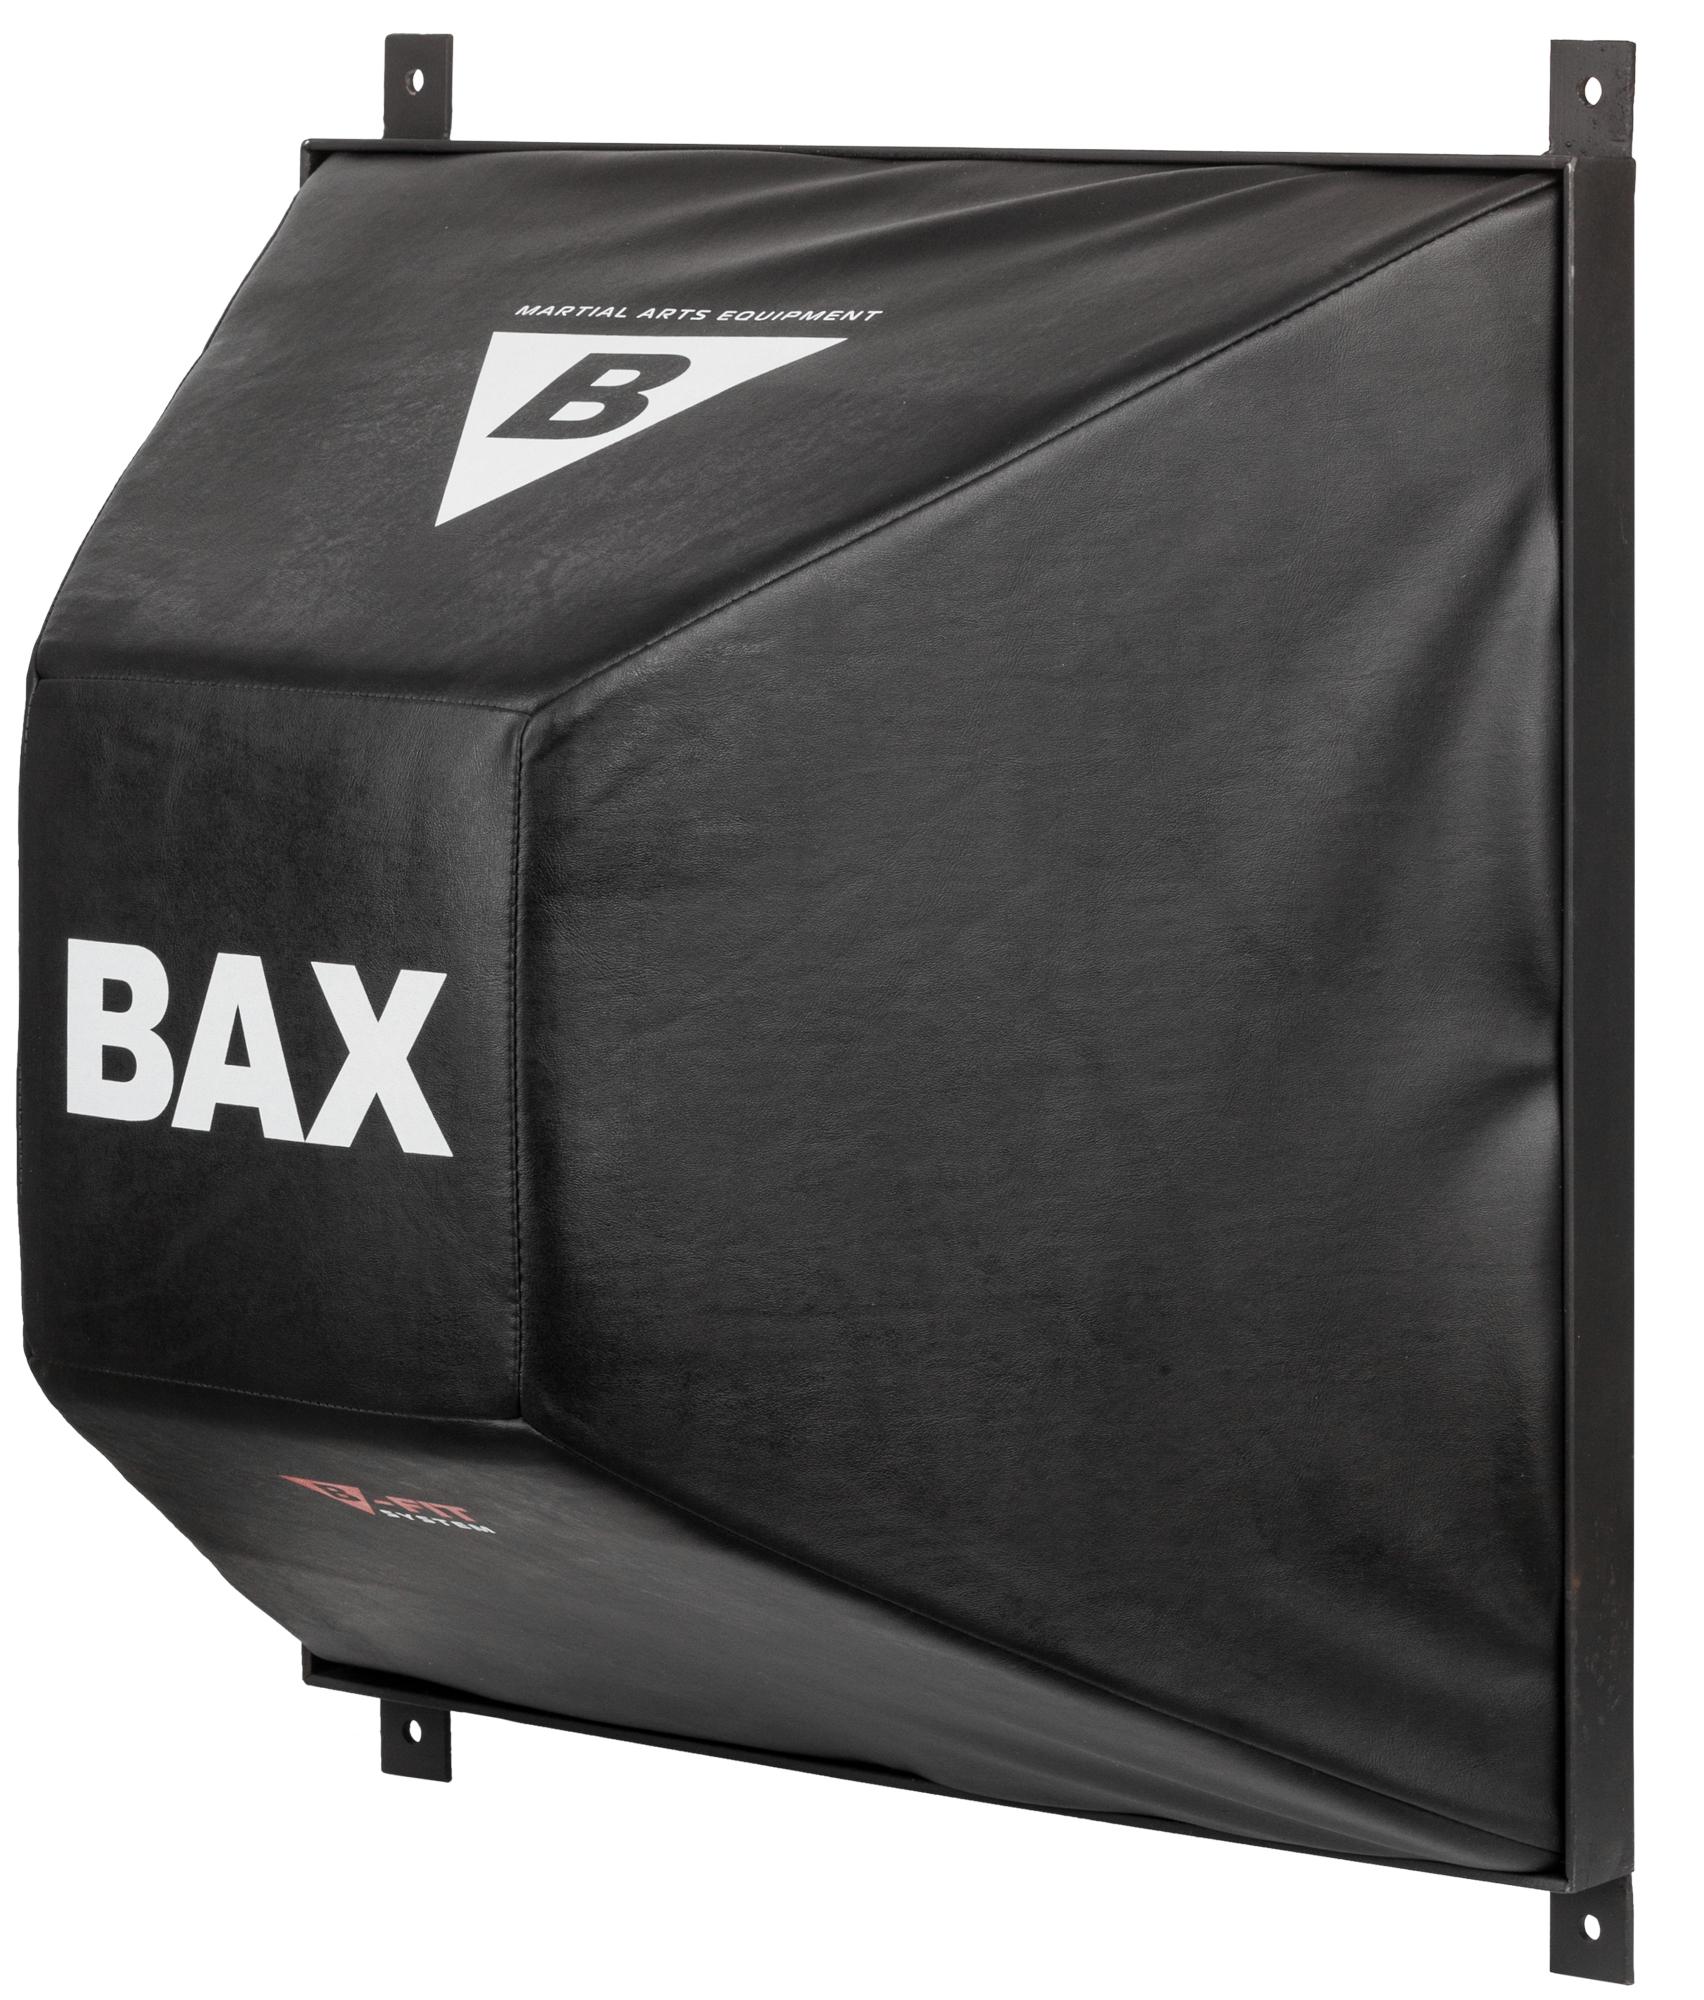 Bax Подушка боксёрская настенная, пирамида Bax bax мешок набивной bax 40 кг